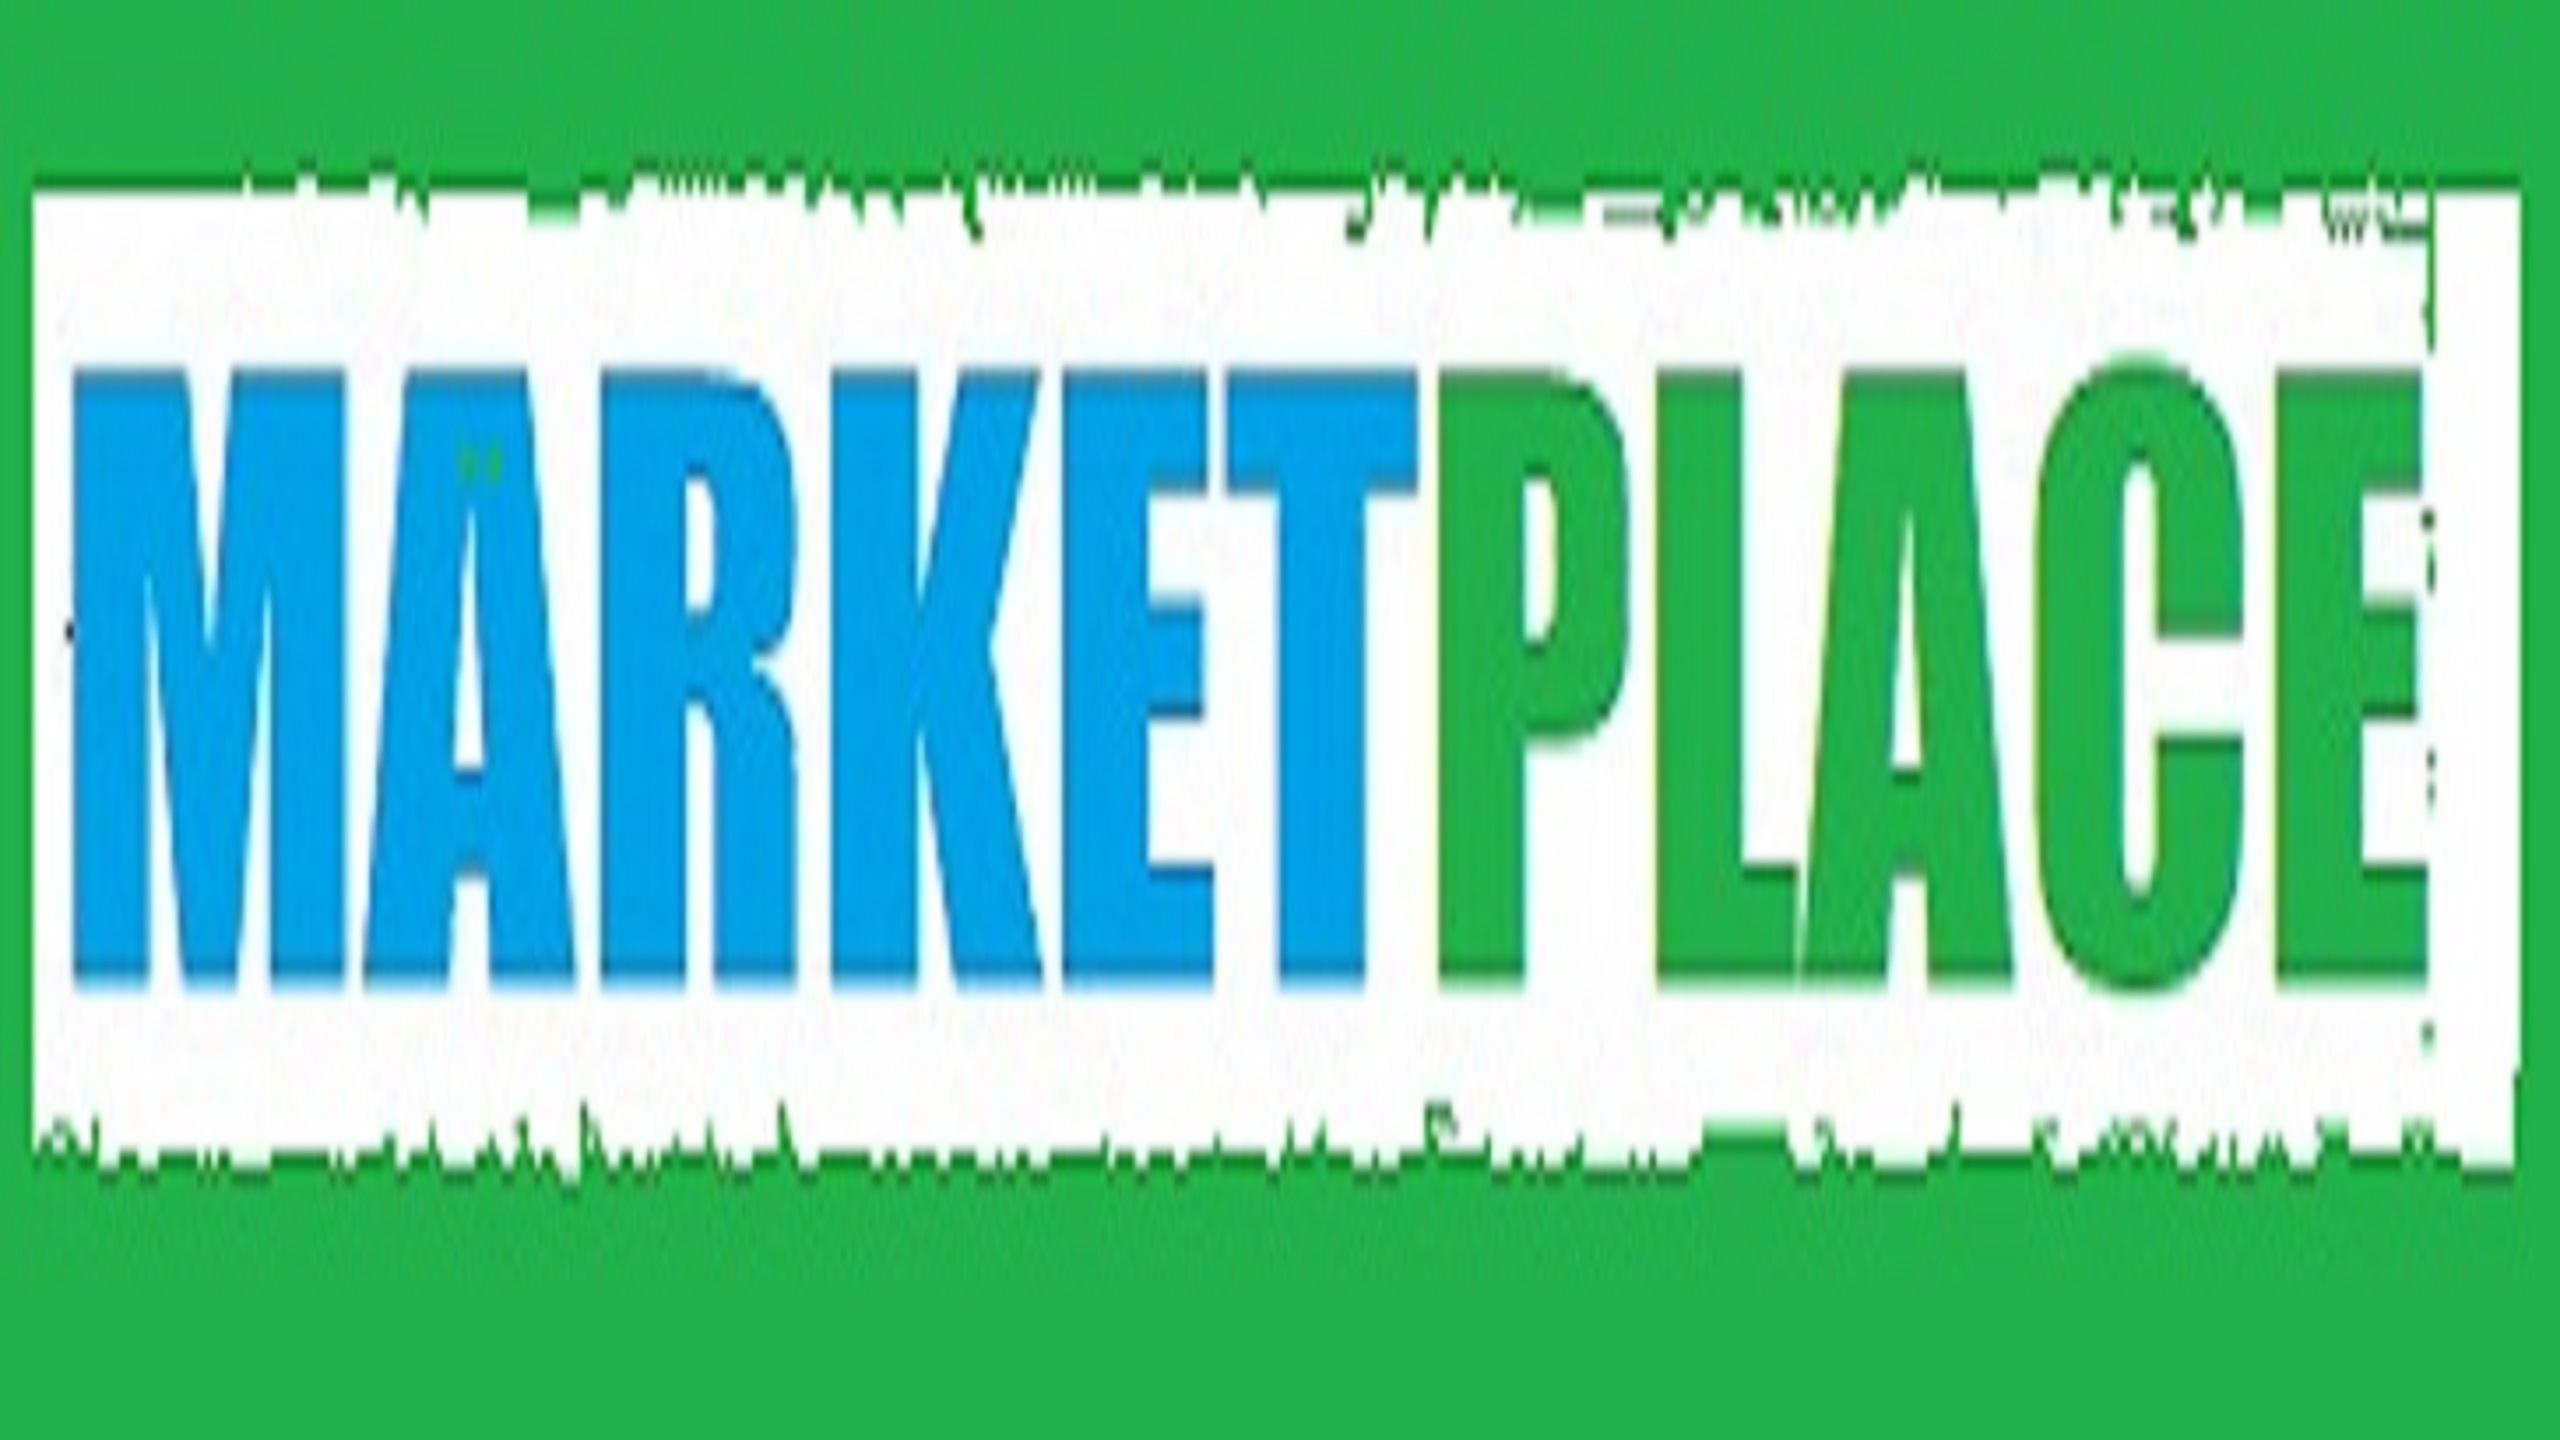 Winthrop Market